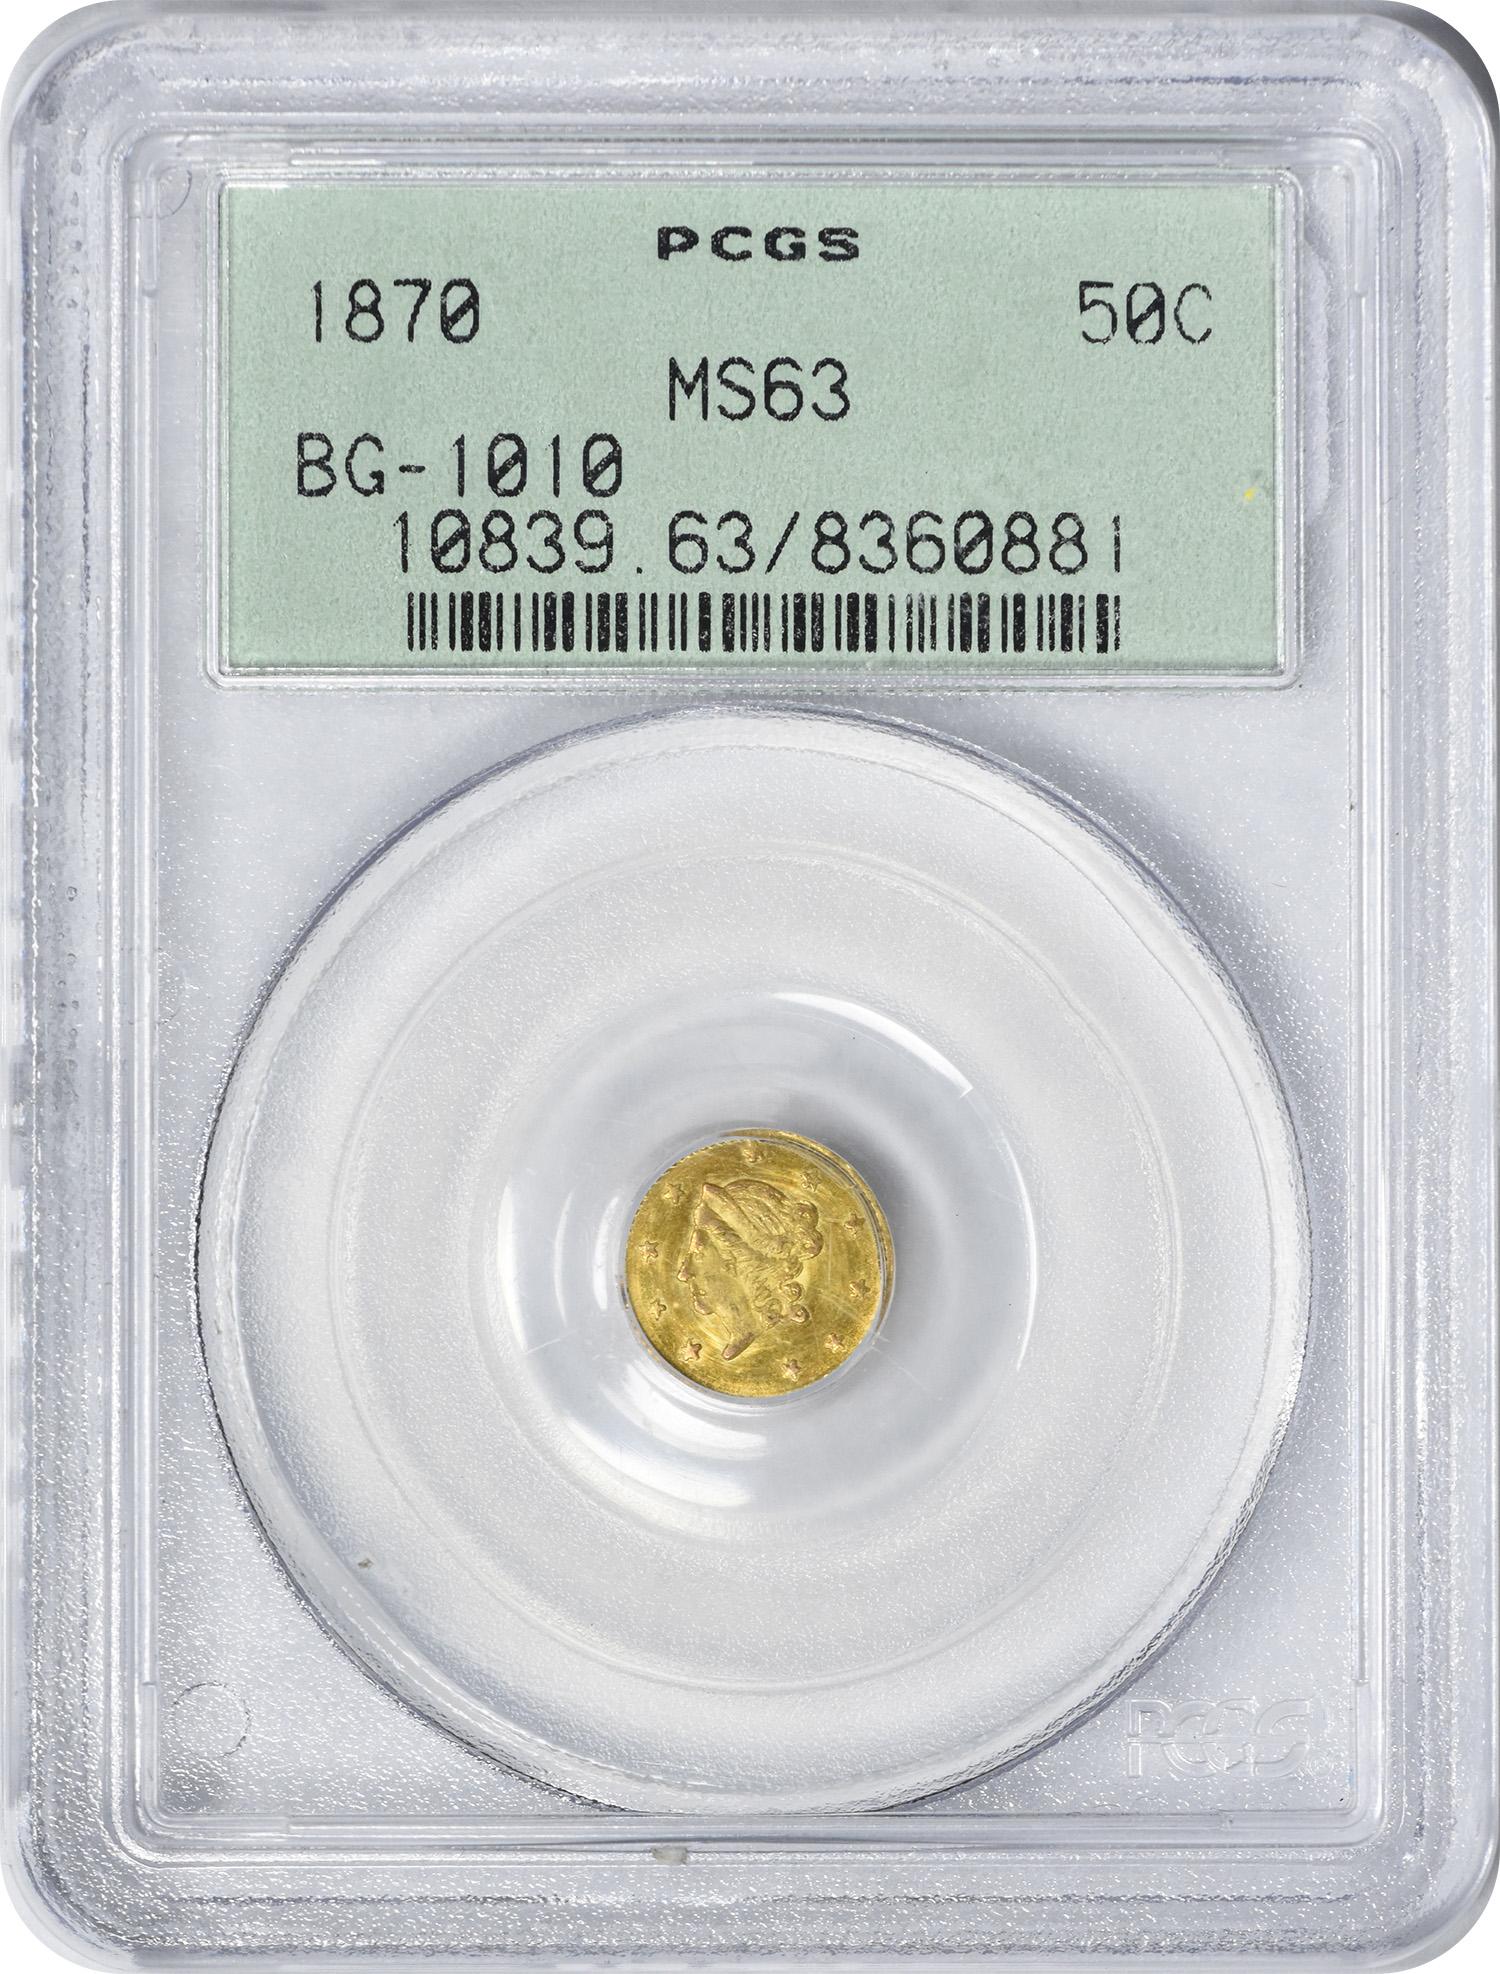 1870 Half Dollar California Gold BG-1010 MS63 PCGS